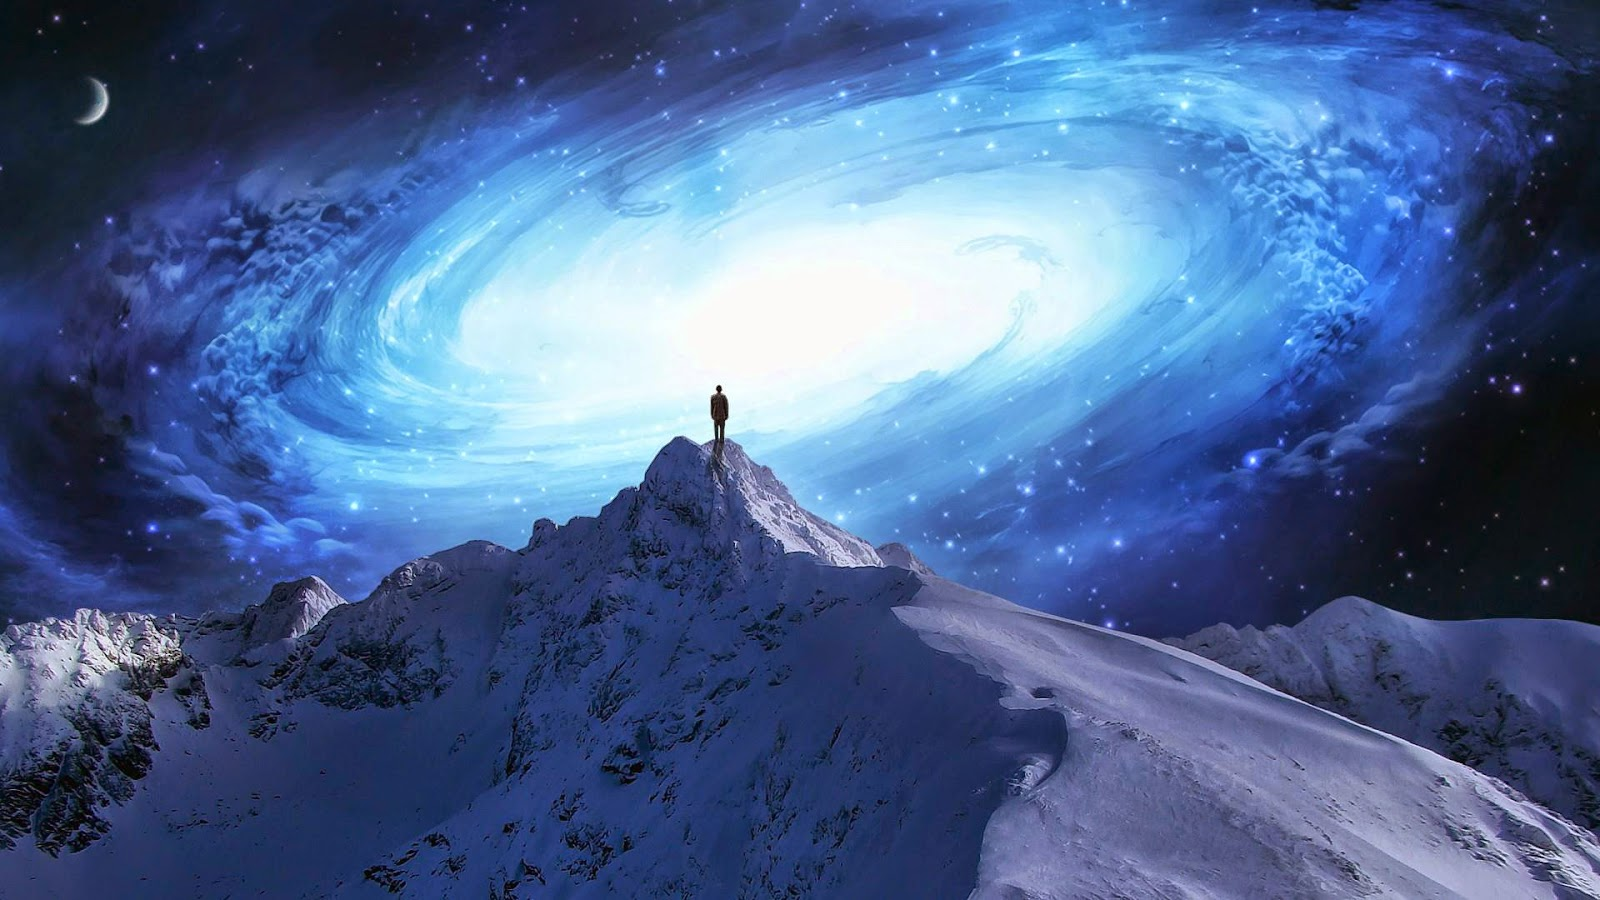 Image result for snow dreams spiritually